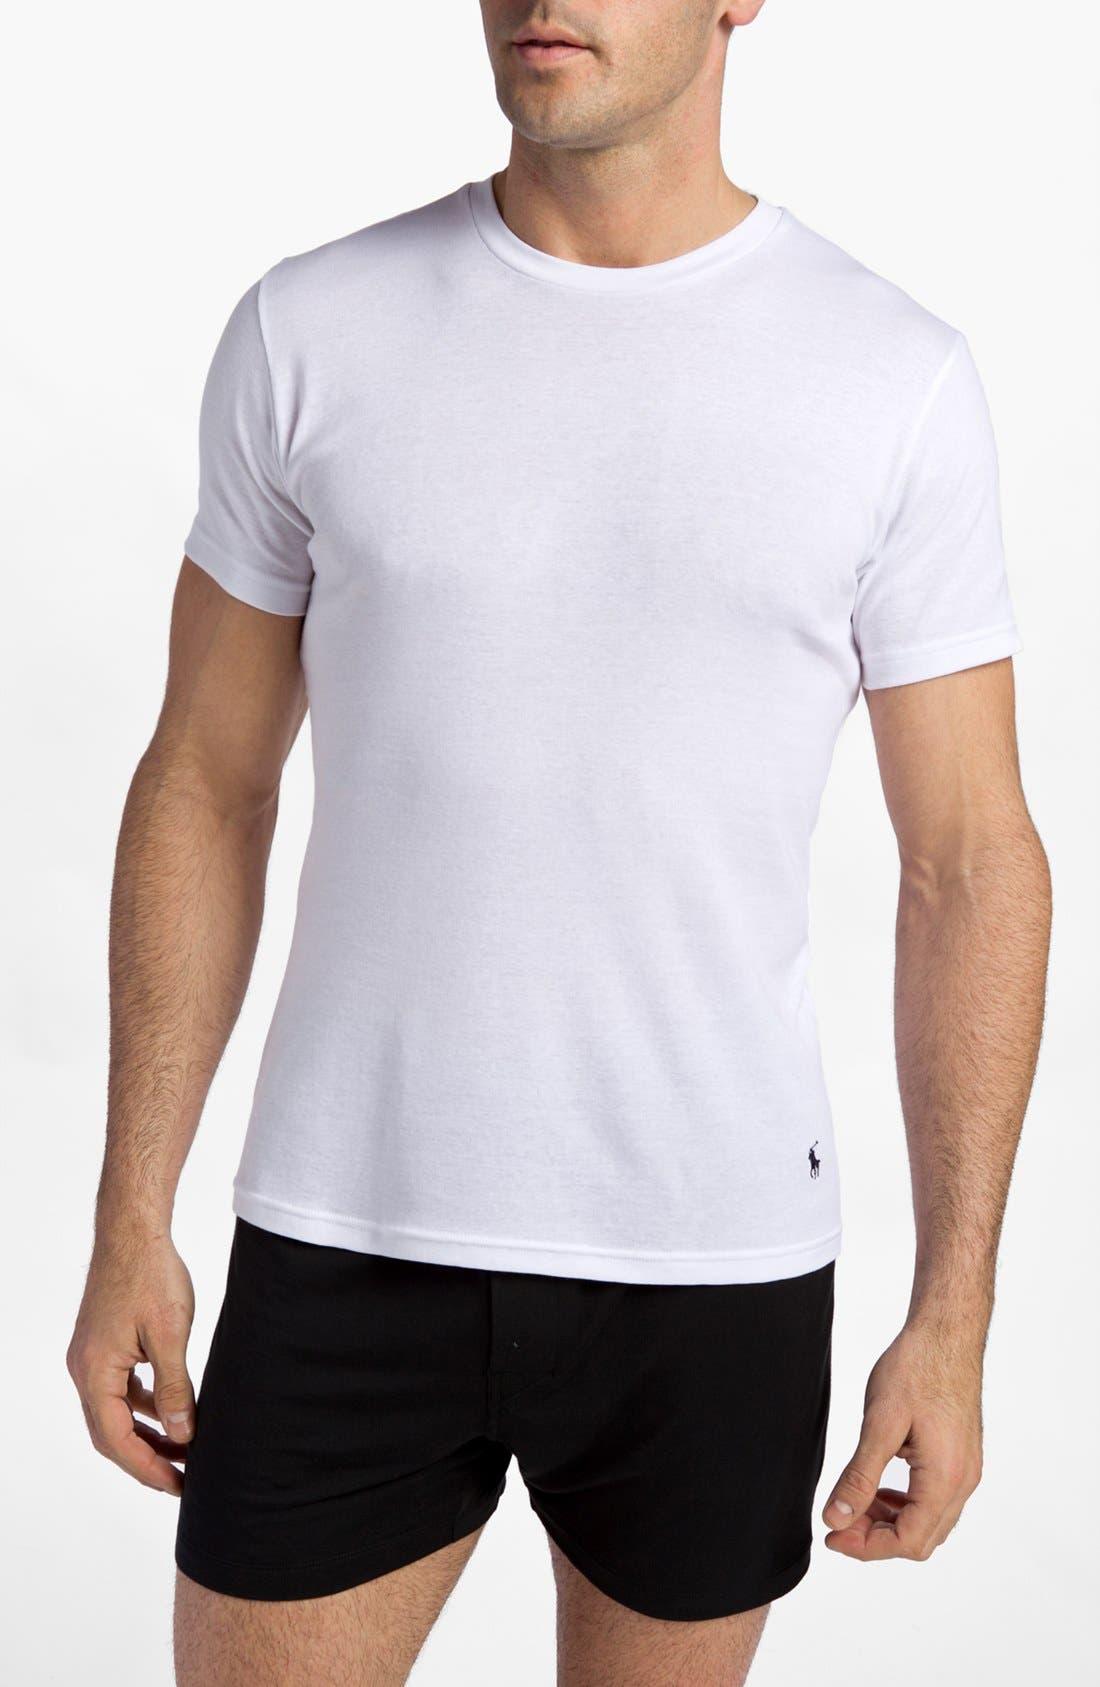 Main Image - Polo Ralph Lauren 2-Pack Cotton Crewneck T-Shirt (Big)